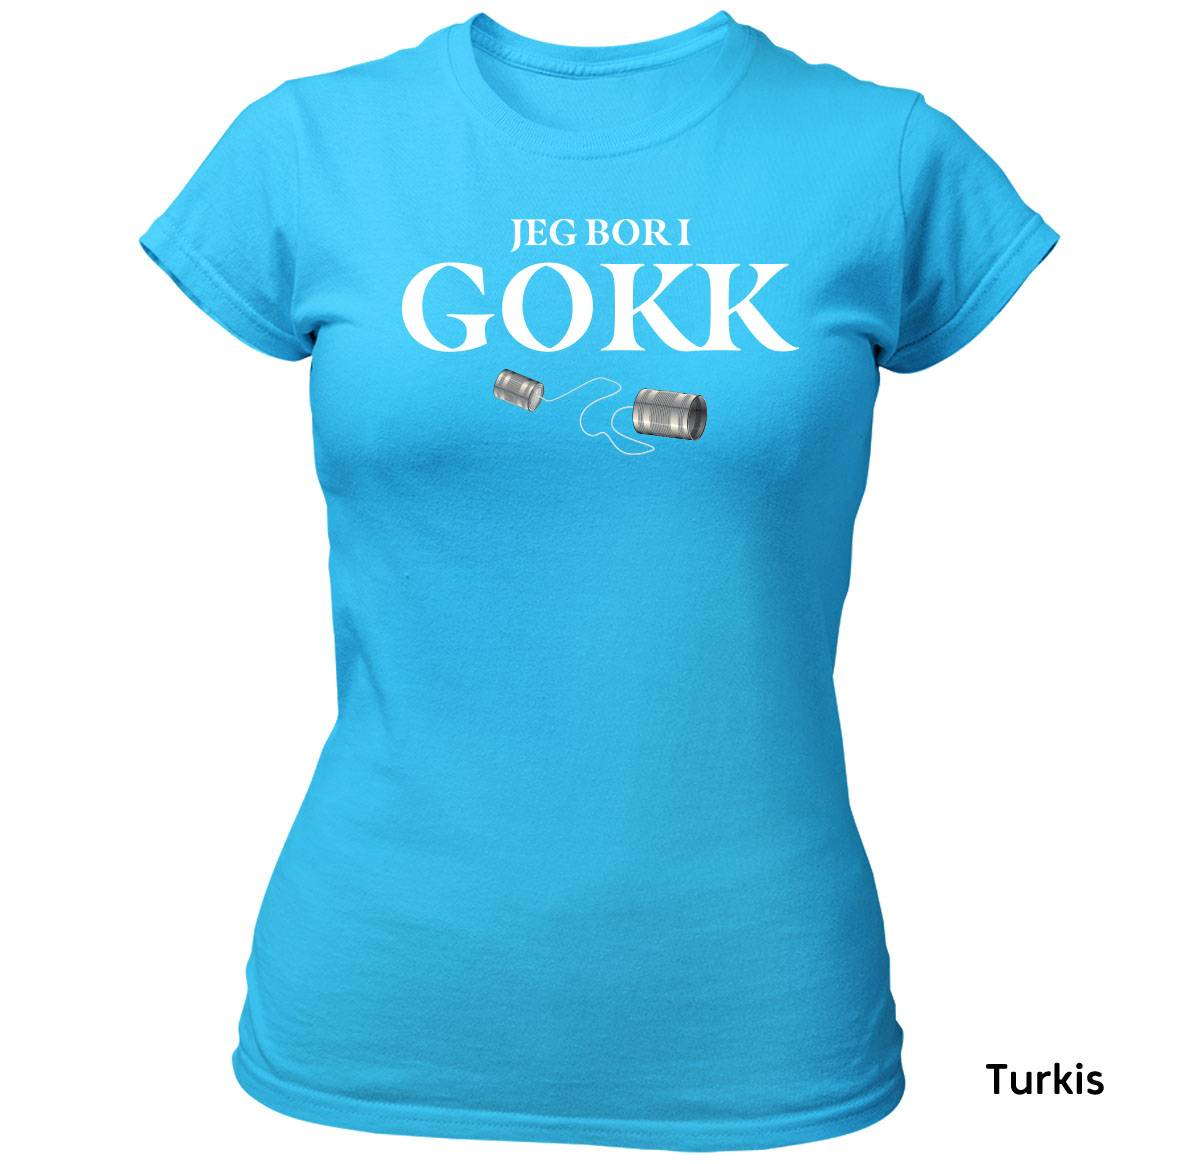 Bor i Gokk T-skjorte DAME